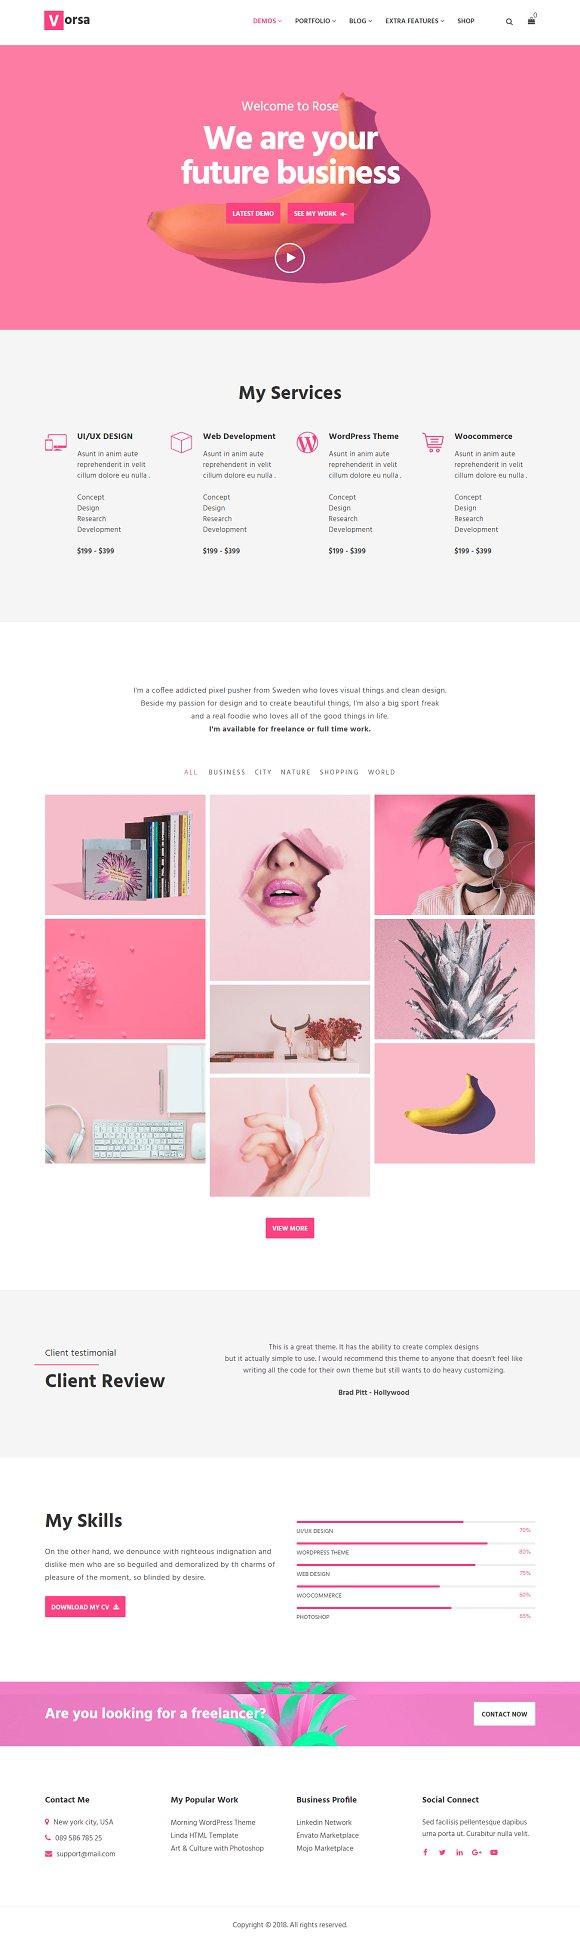 Vorsa Portfolio WordPress Theme